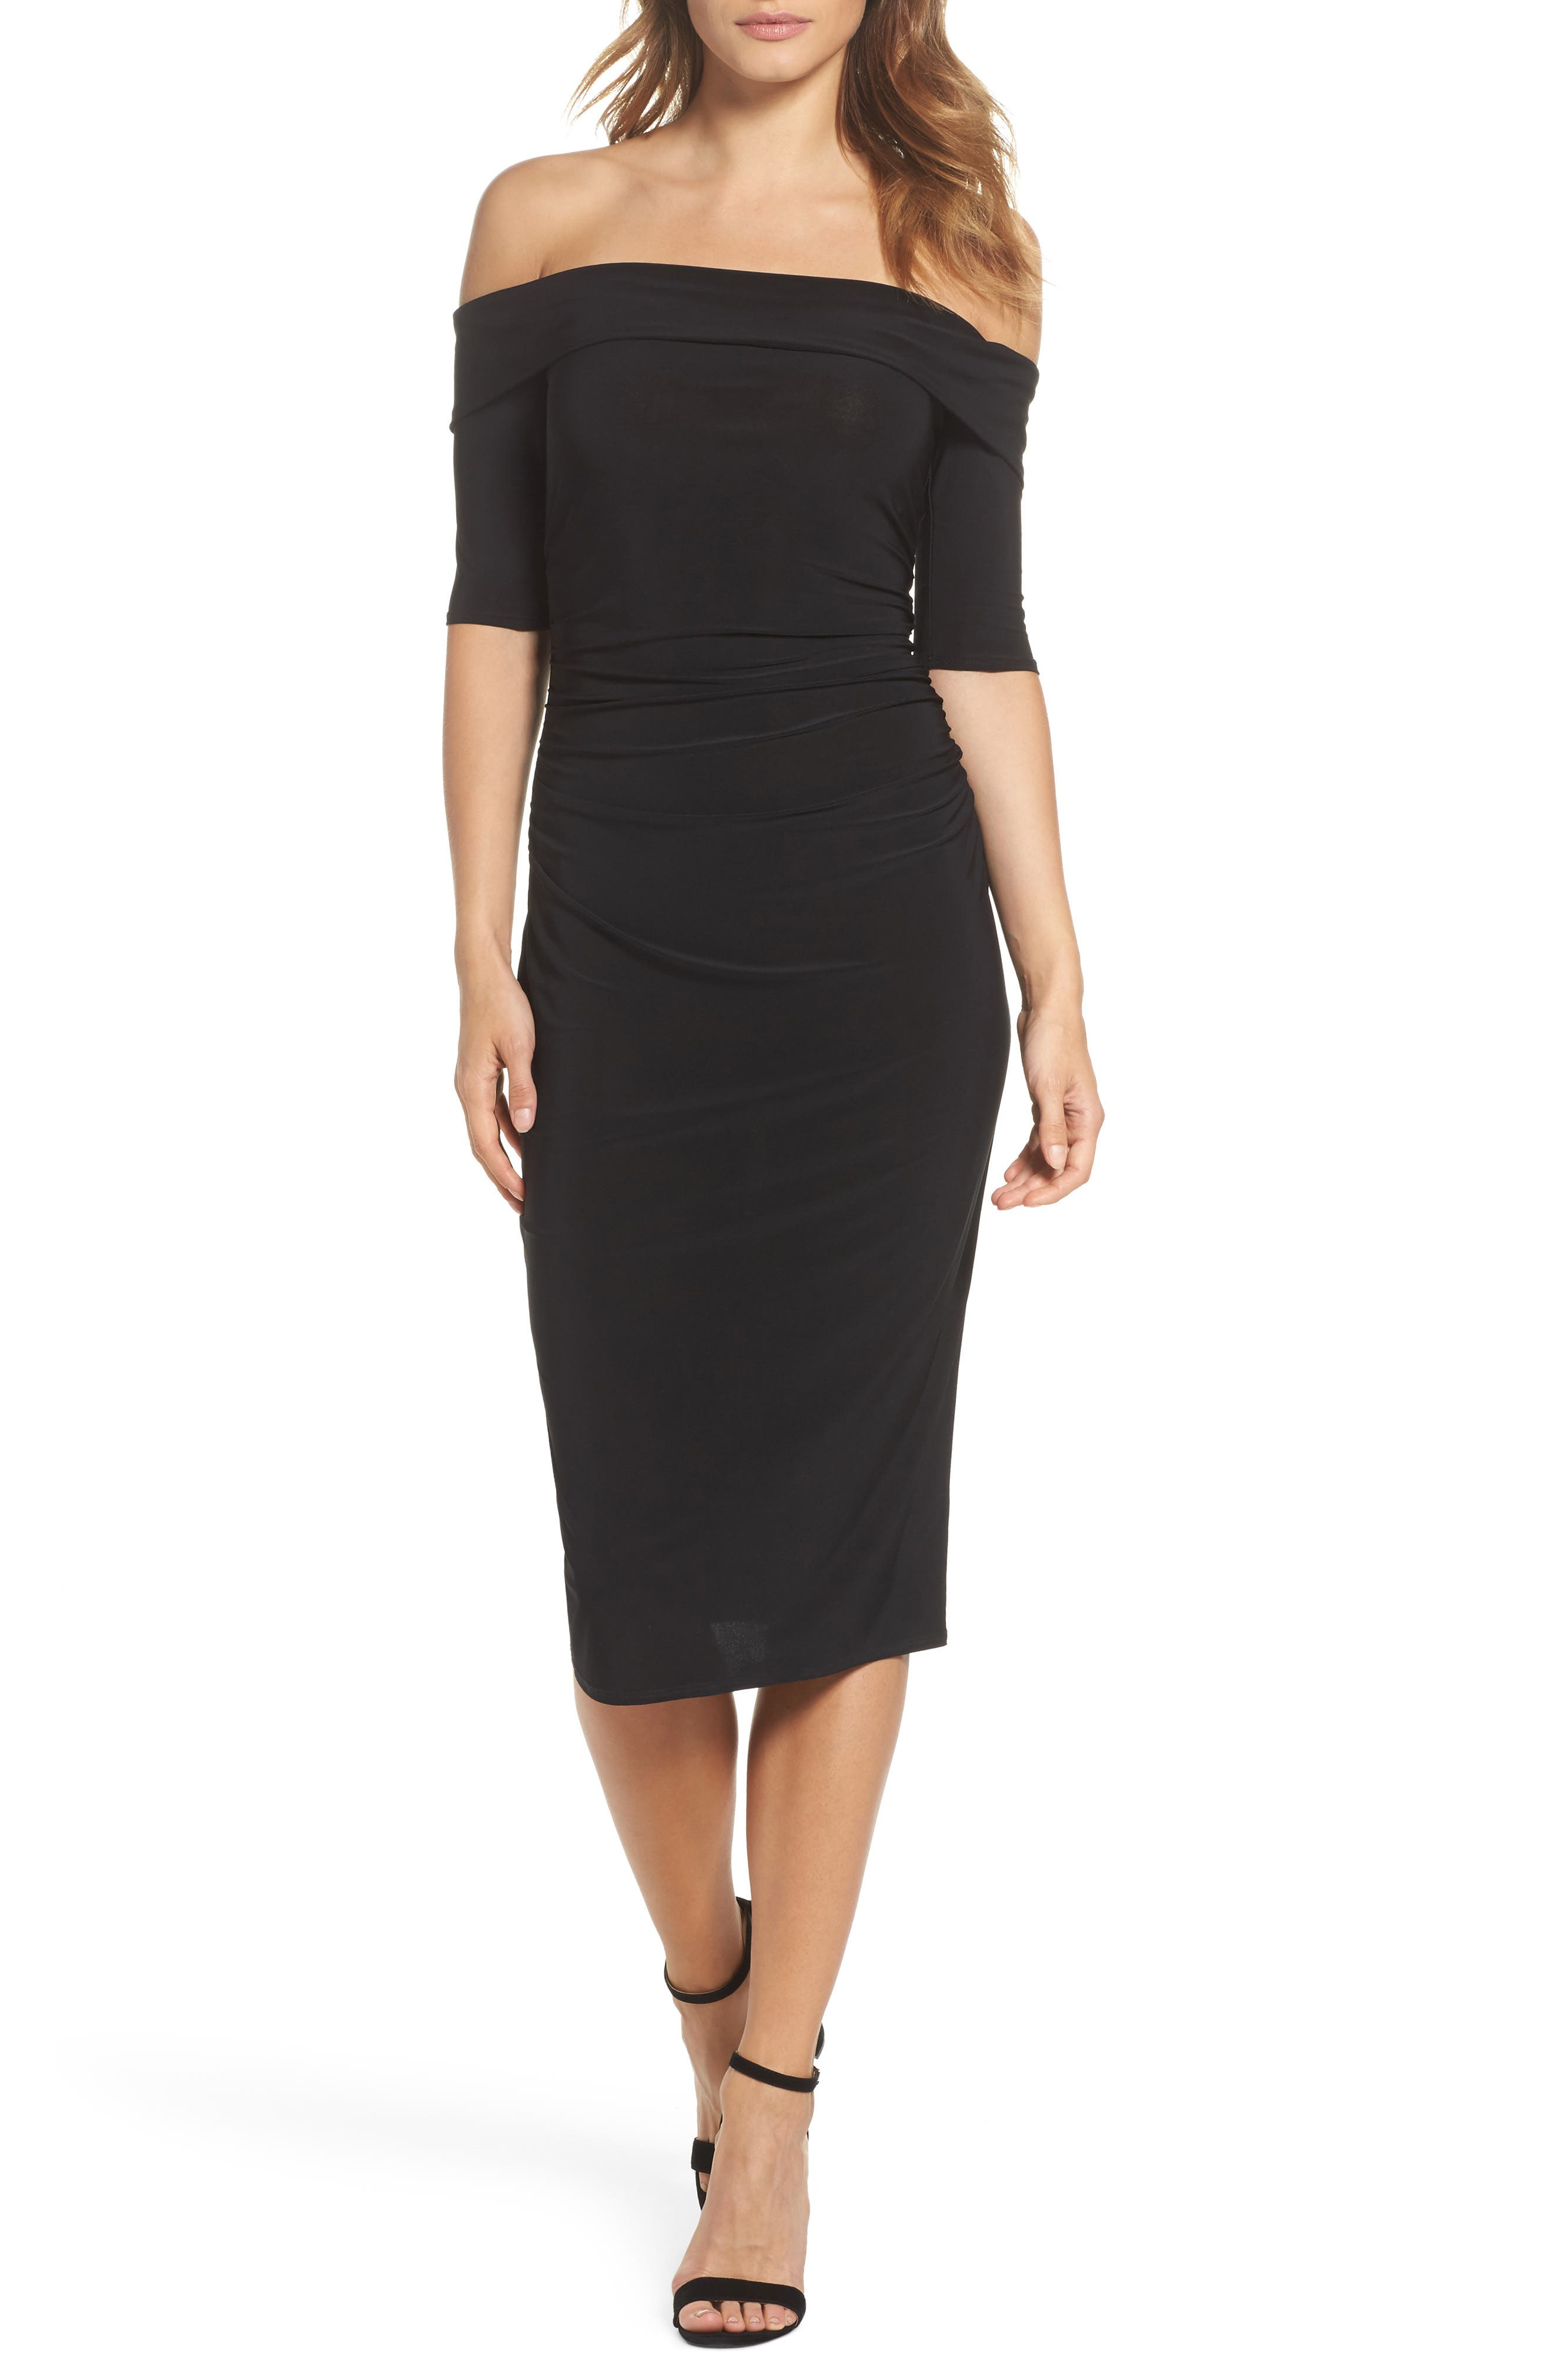 Jacey Off the Shoulder Sheath Dress,                             Main thumbnail 1, color,                             Black